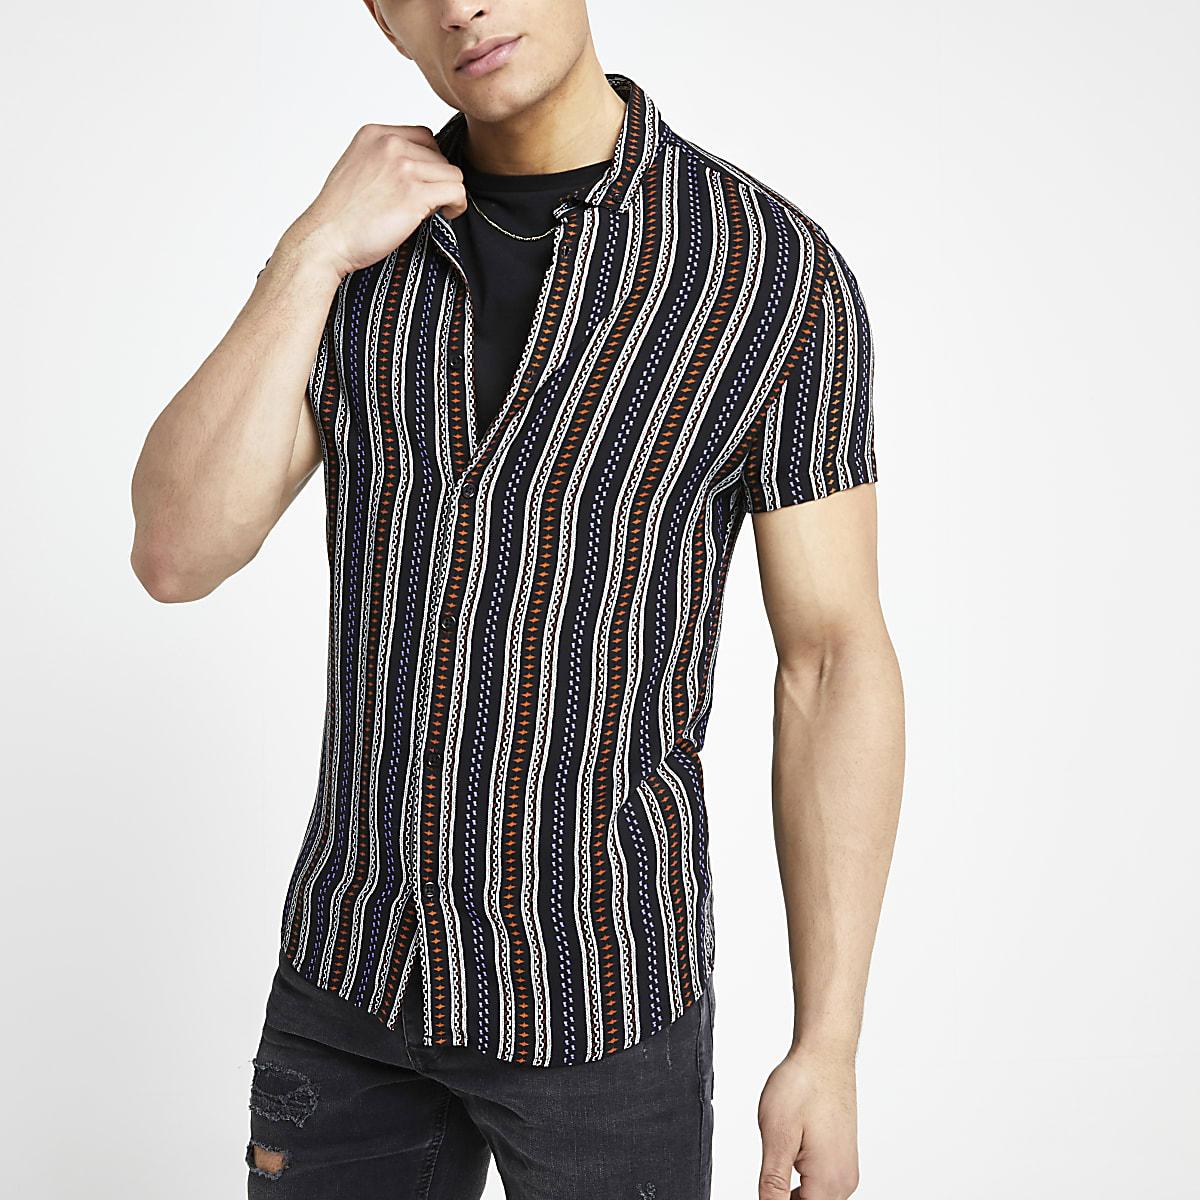 Black stripe and aztec print shirt